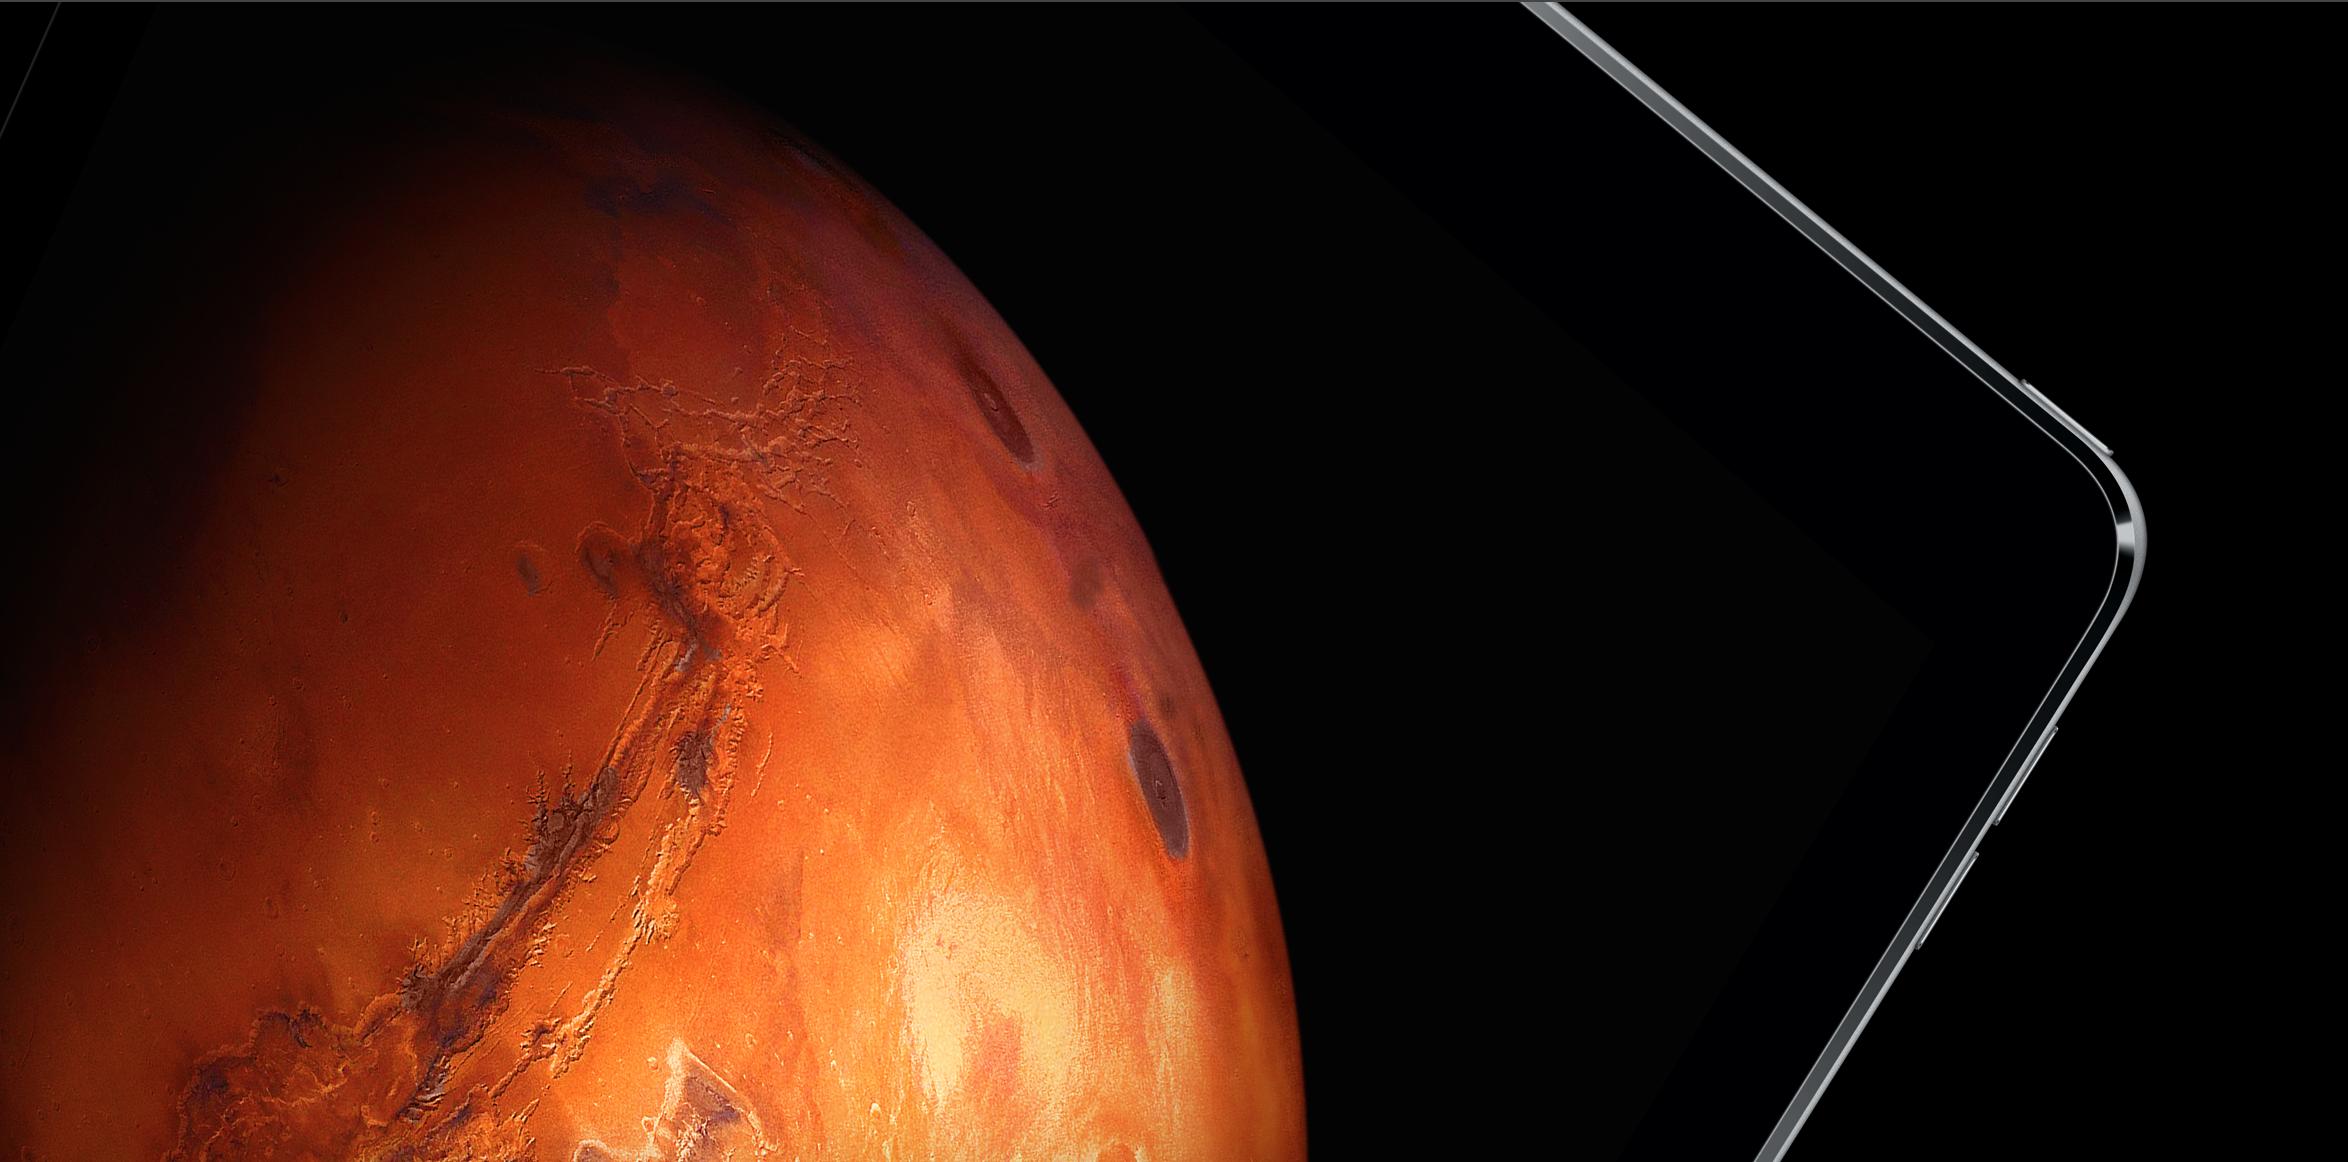 Screenshot 2015-10-30 13.23.37